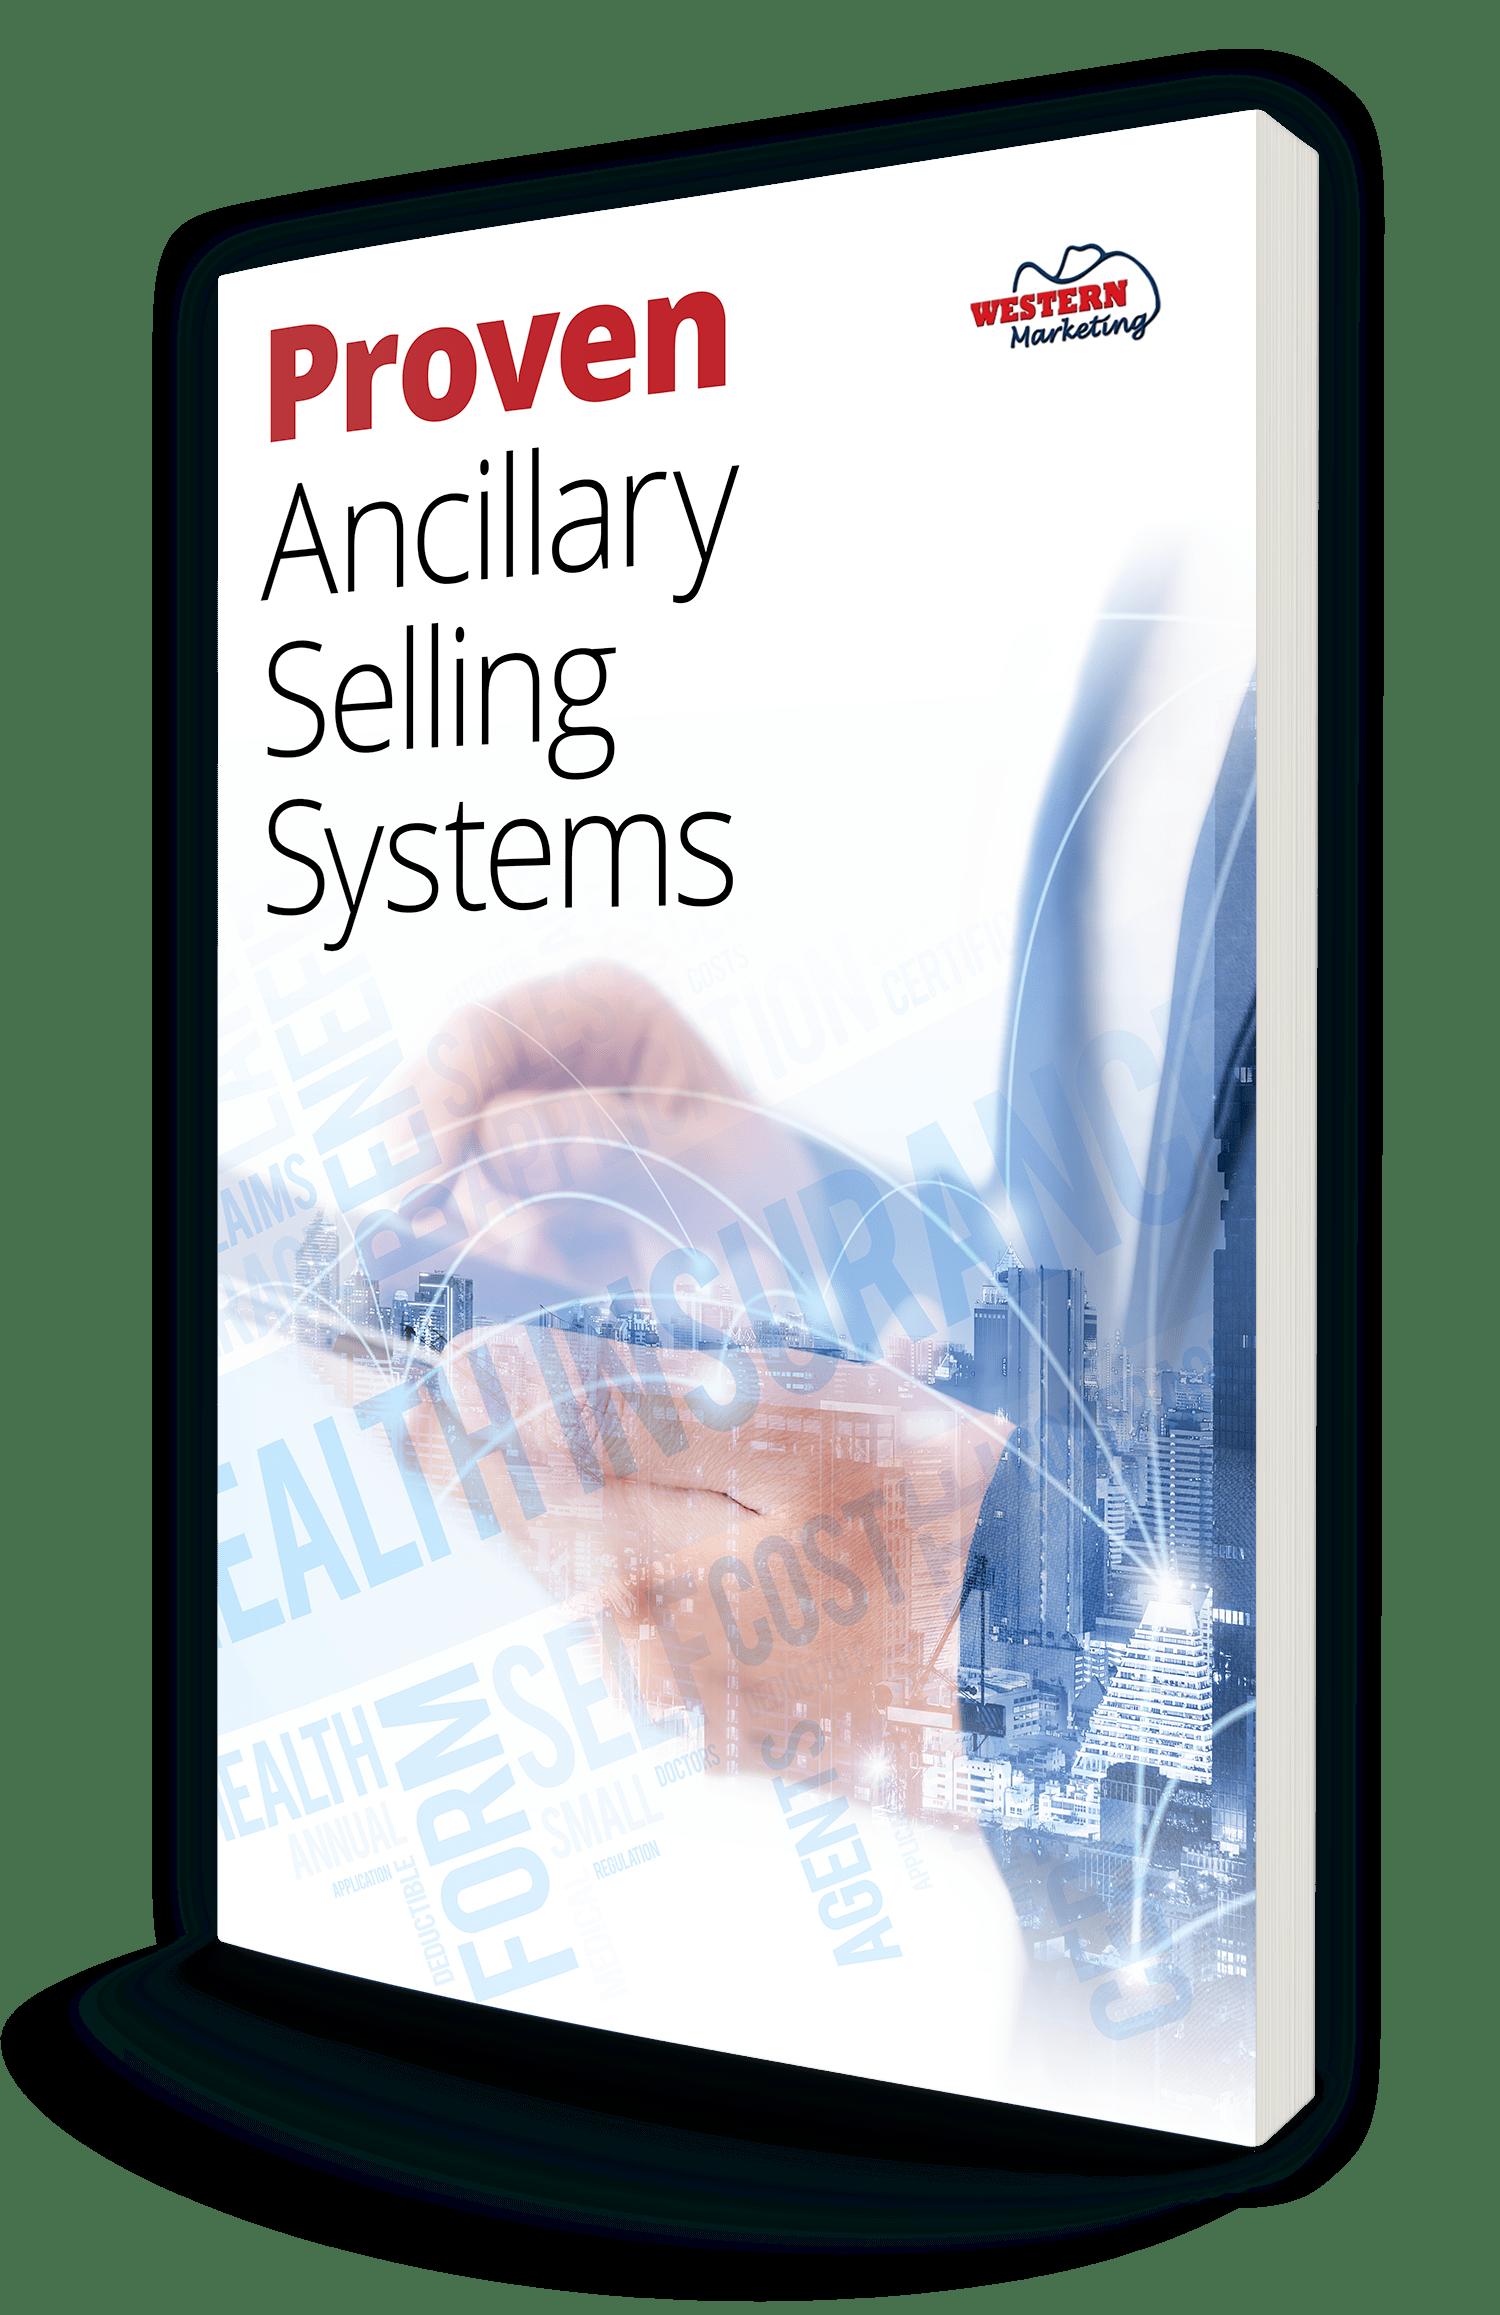 ProvenAncillarySellingSystems.png